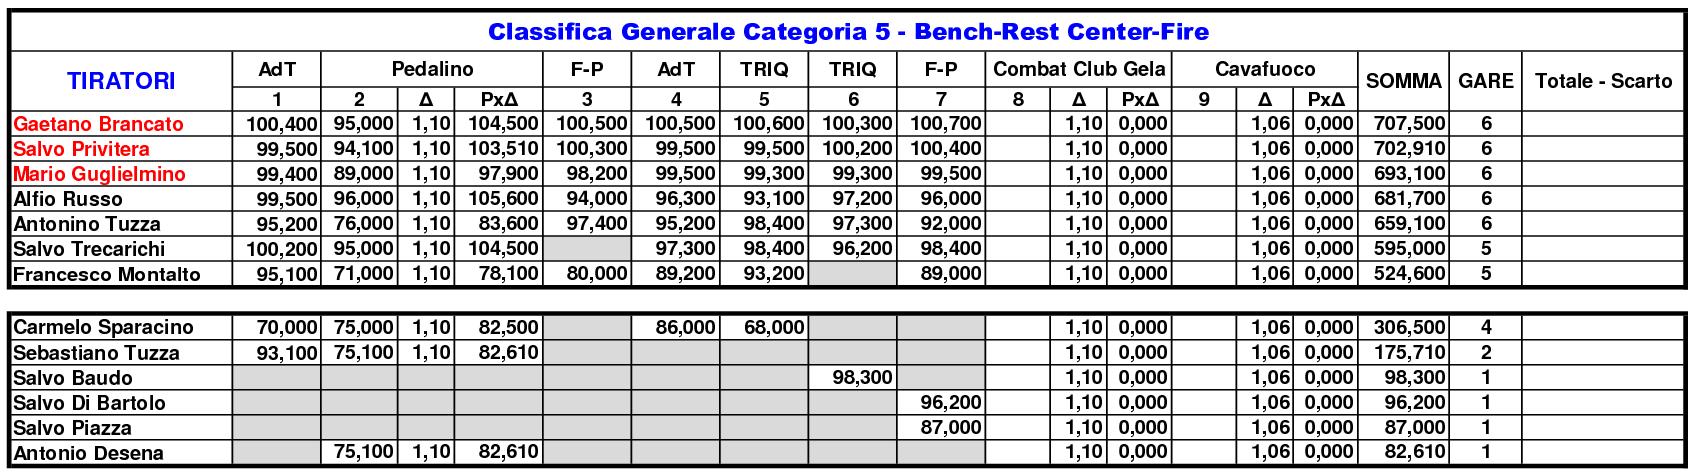 Classifica Generale 202011